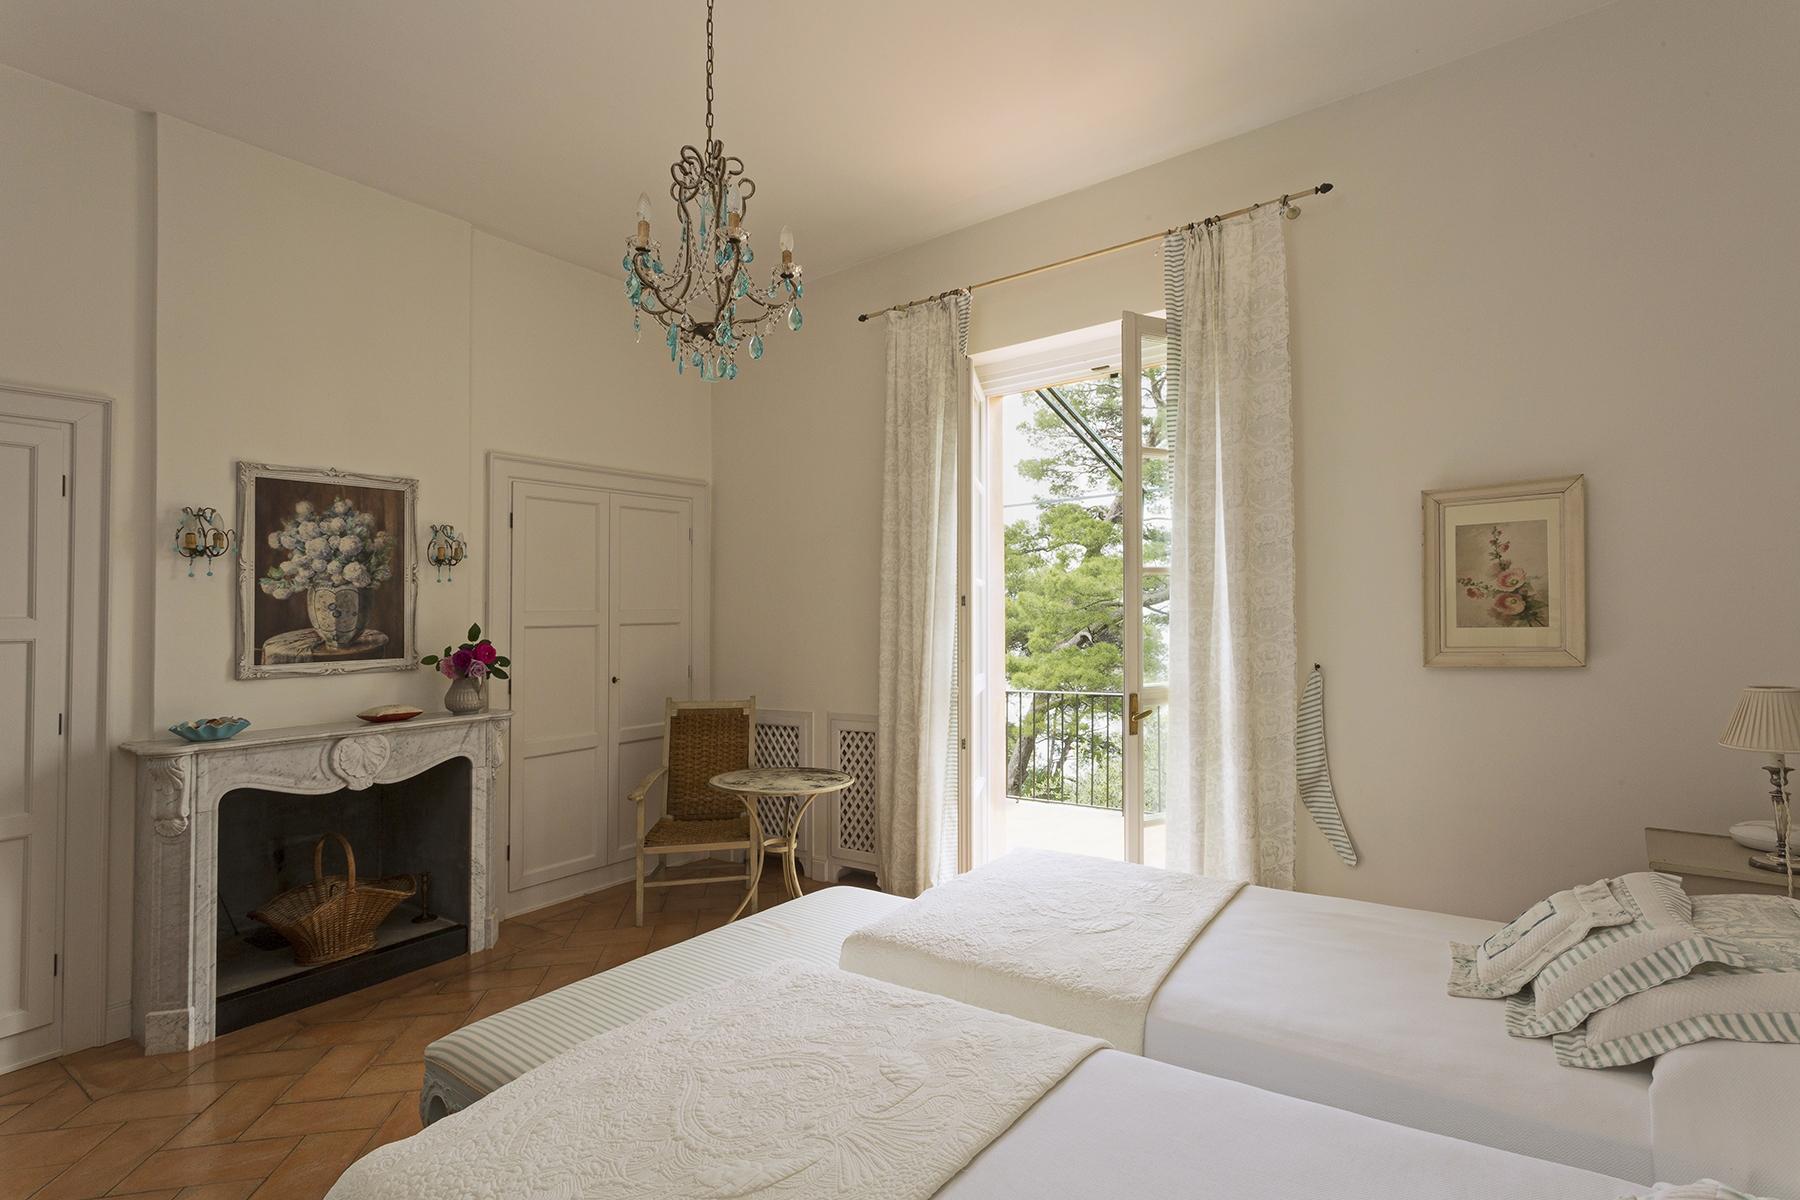 Villa in Vendita a Santa Margherita Ligure: 5 locali, 580 mq - Foto 25